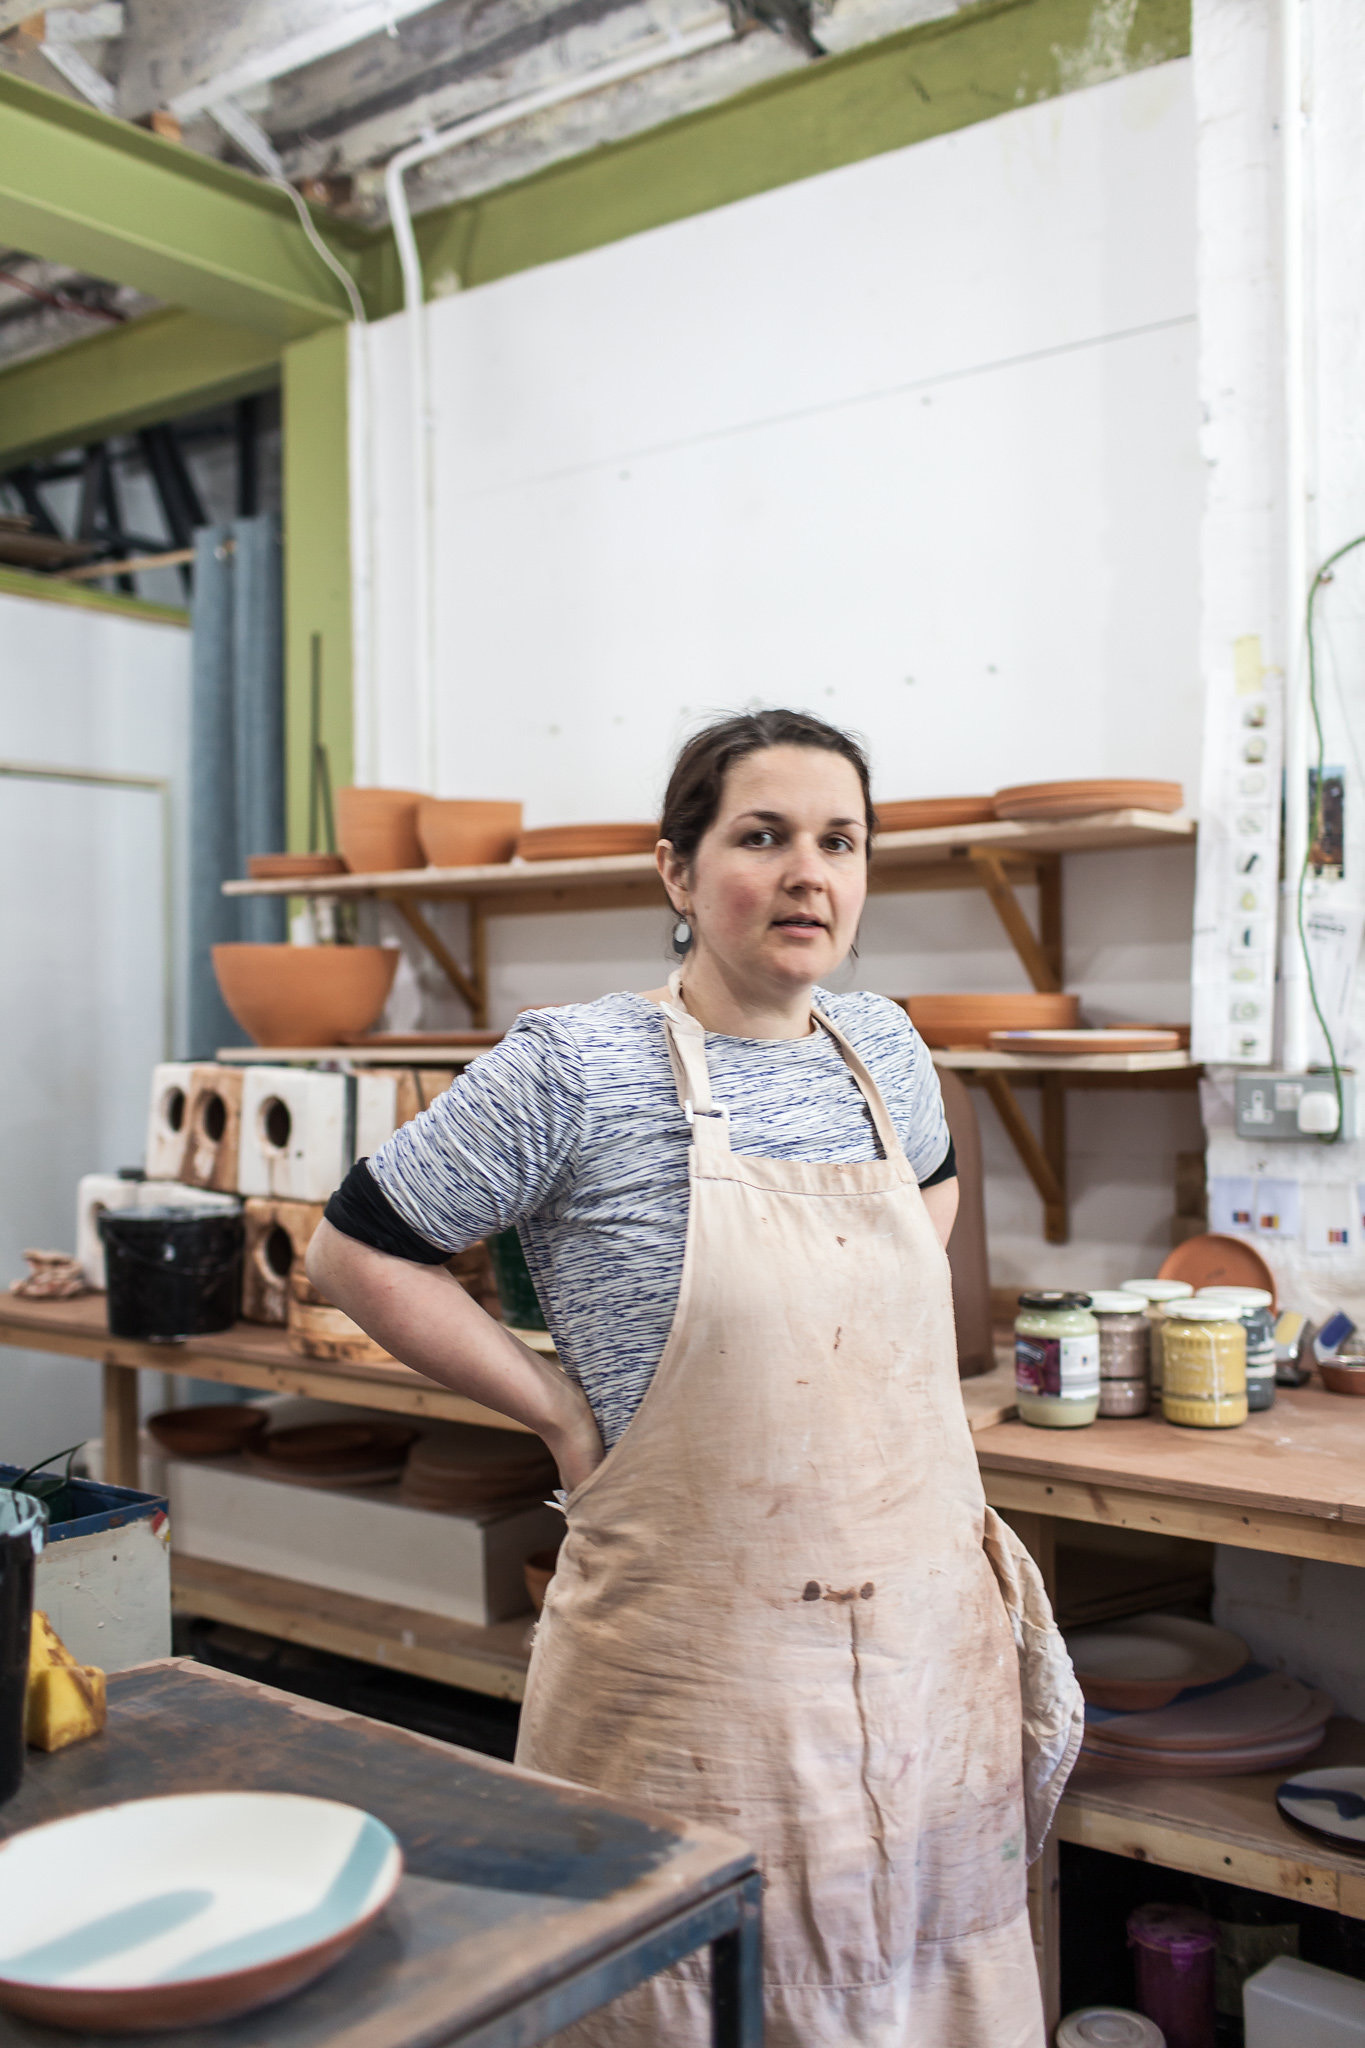 Silvia K Ceramics + Studio Portraits   Award winning ceramicist Silvia K captured at work